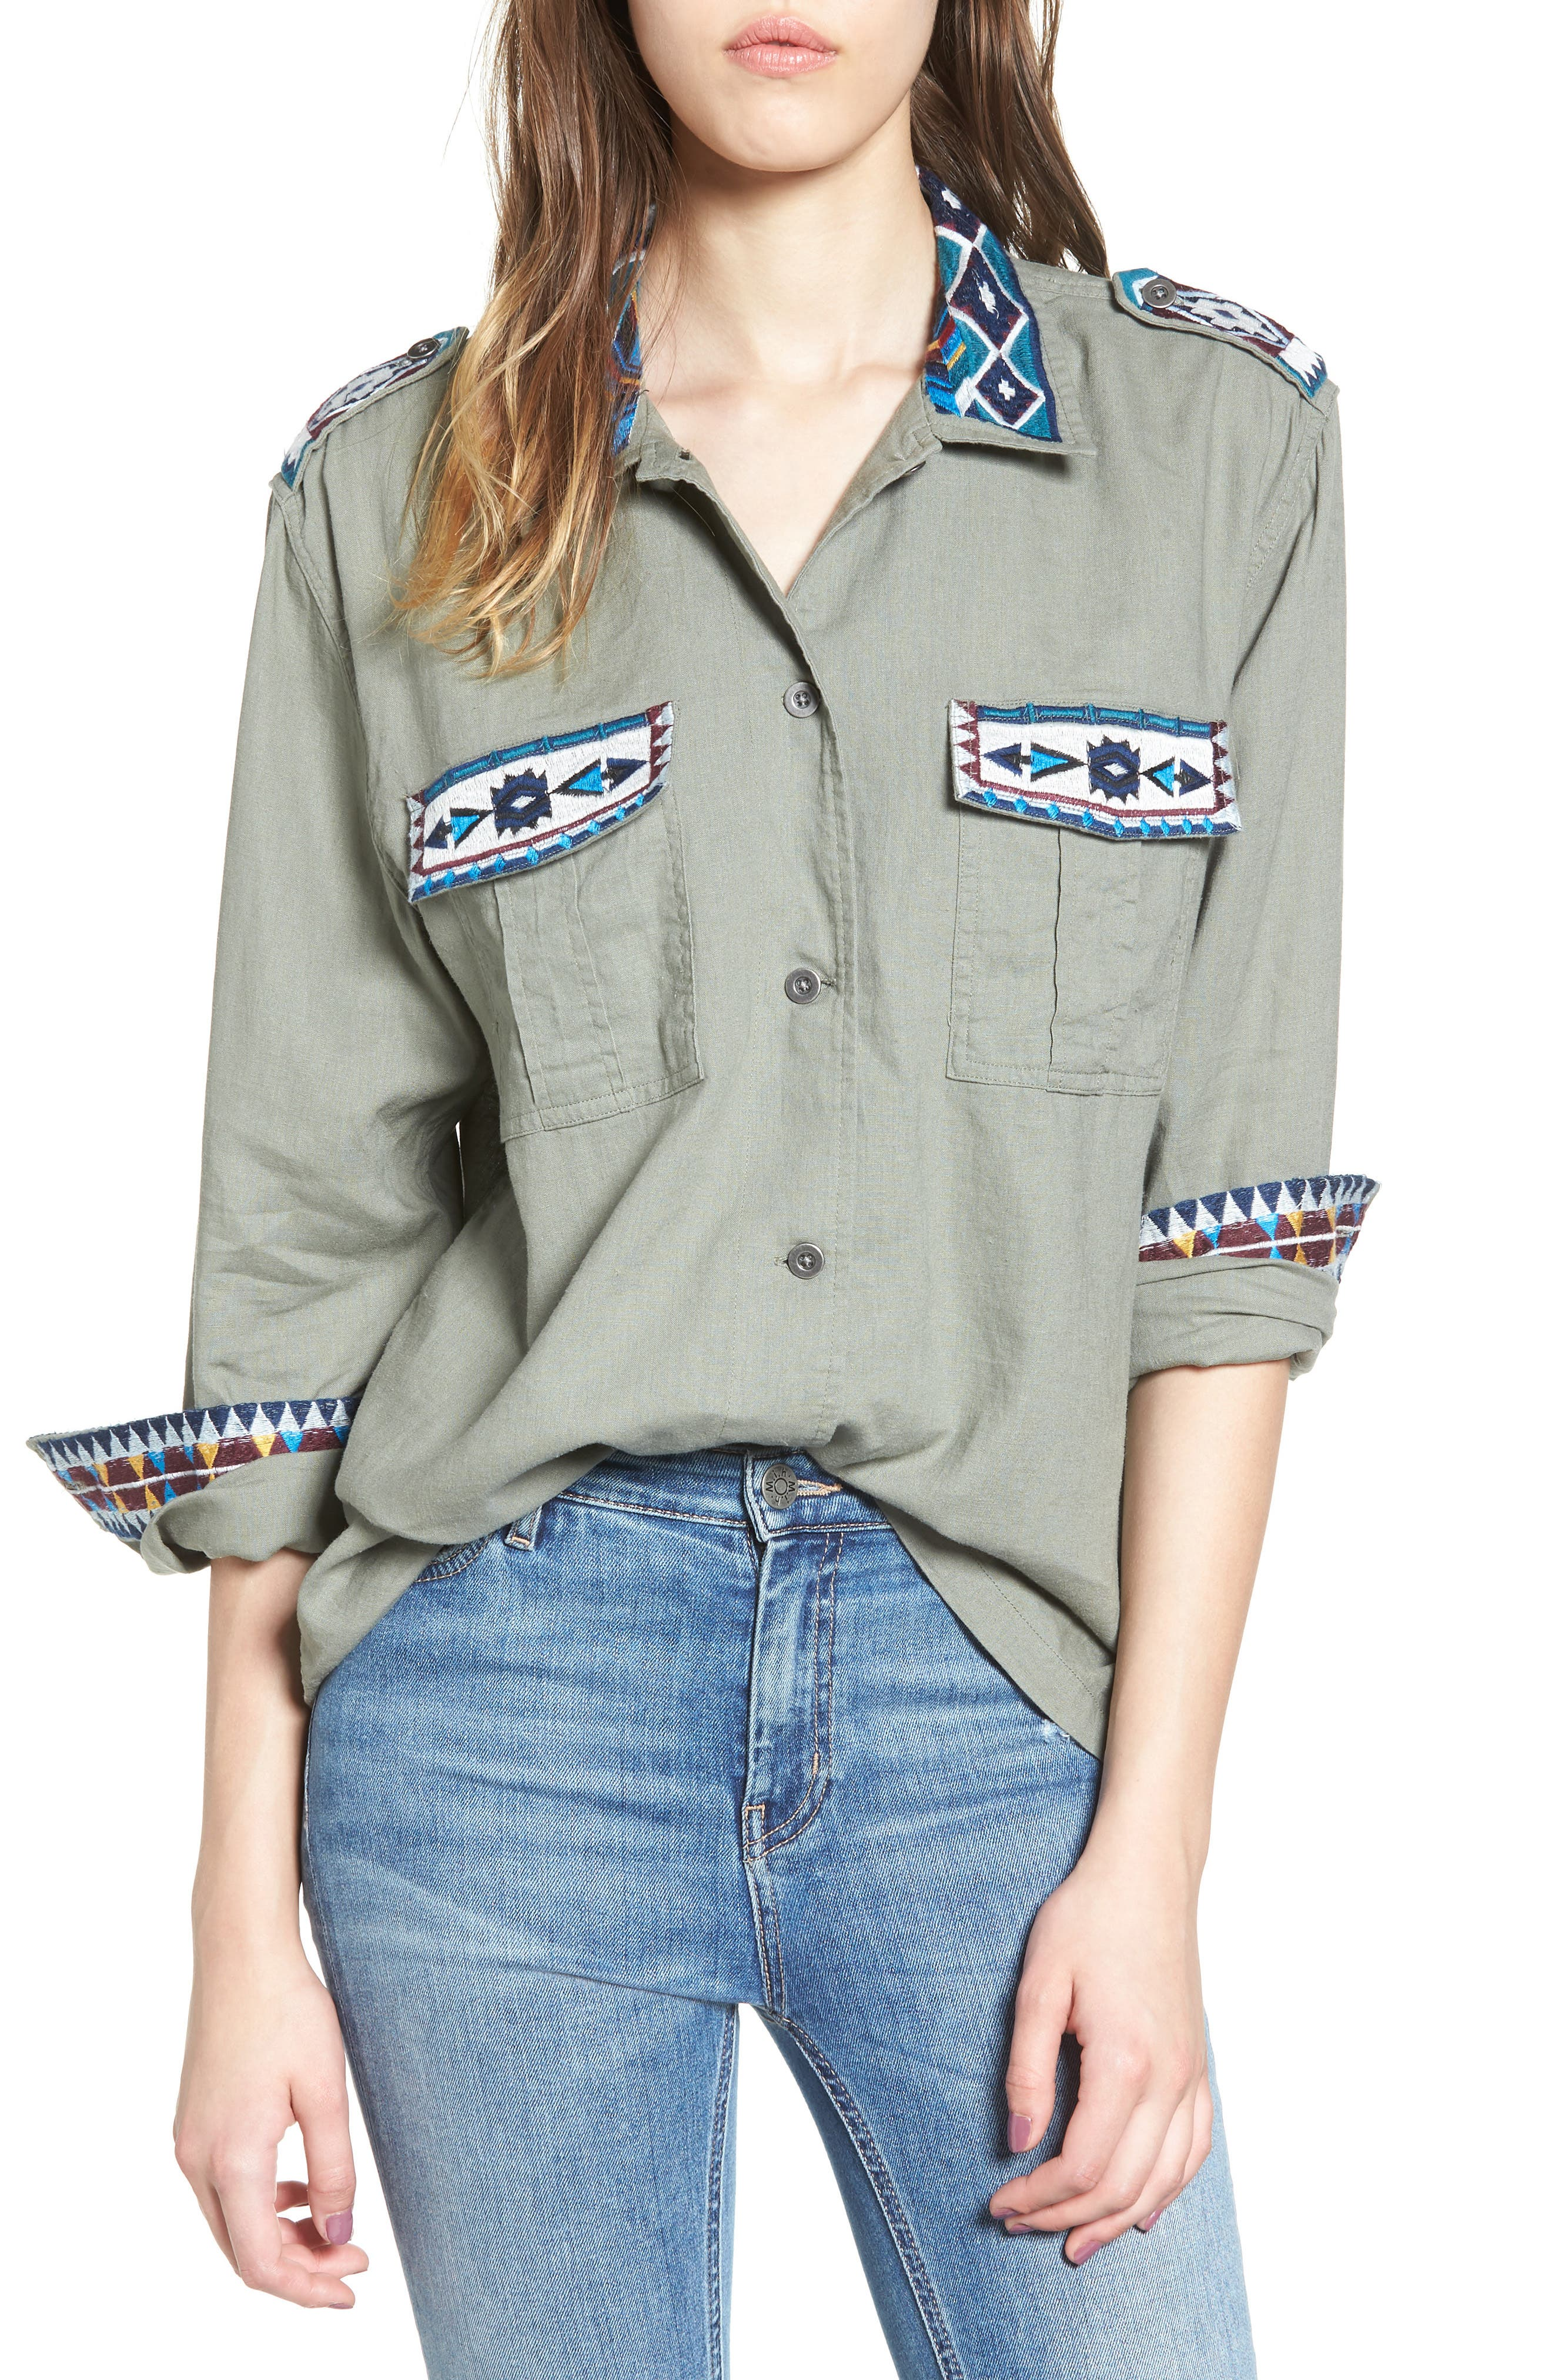 Kona Embroidered Shirt,                             Main thumbnail 1, color,                             320